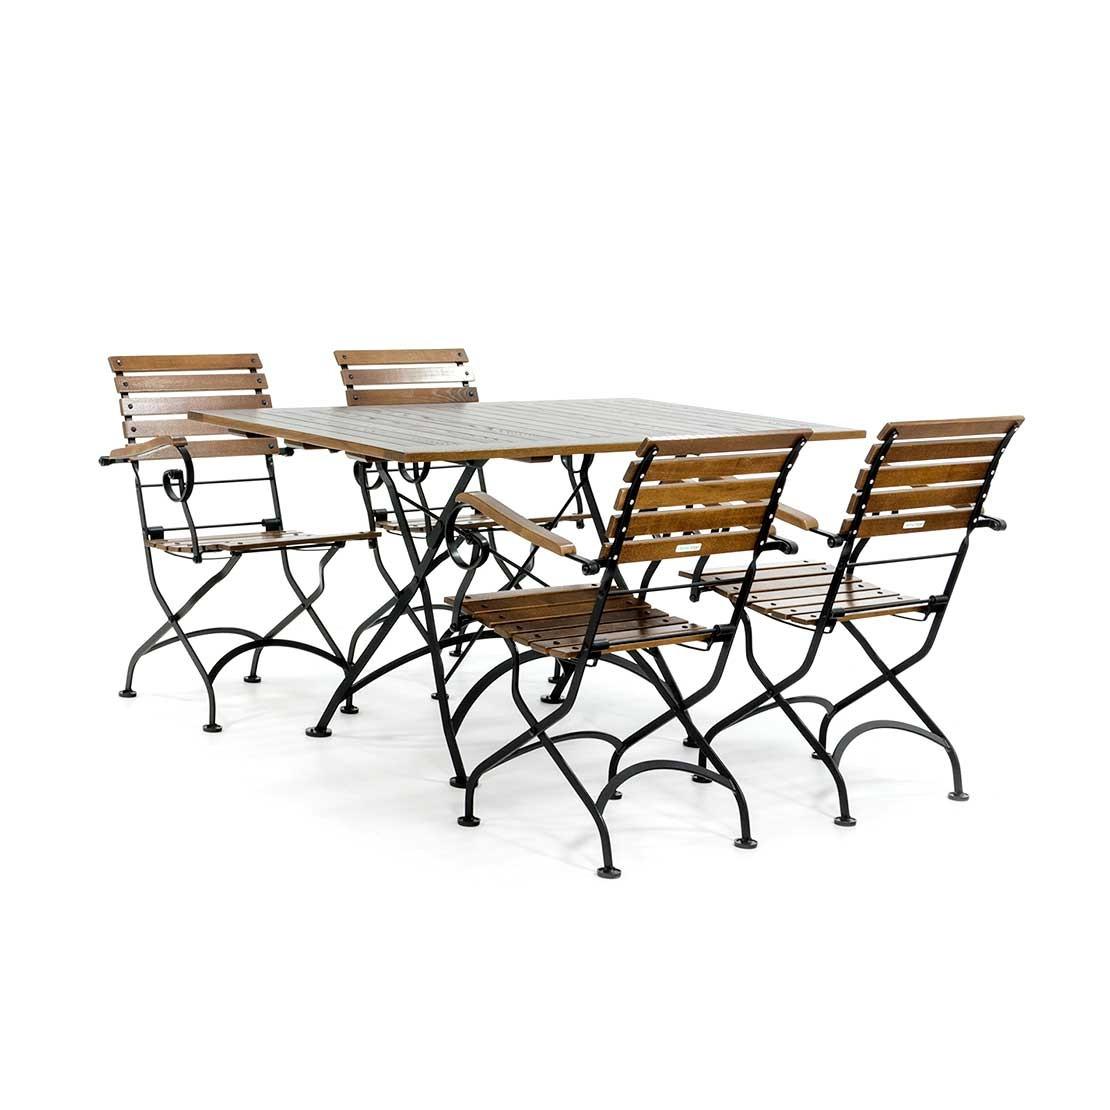 schmiedeeisen materialien. Black Bedroom Furniture Sets. Home Design Ideas